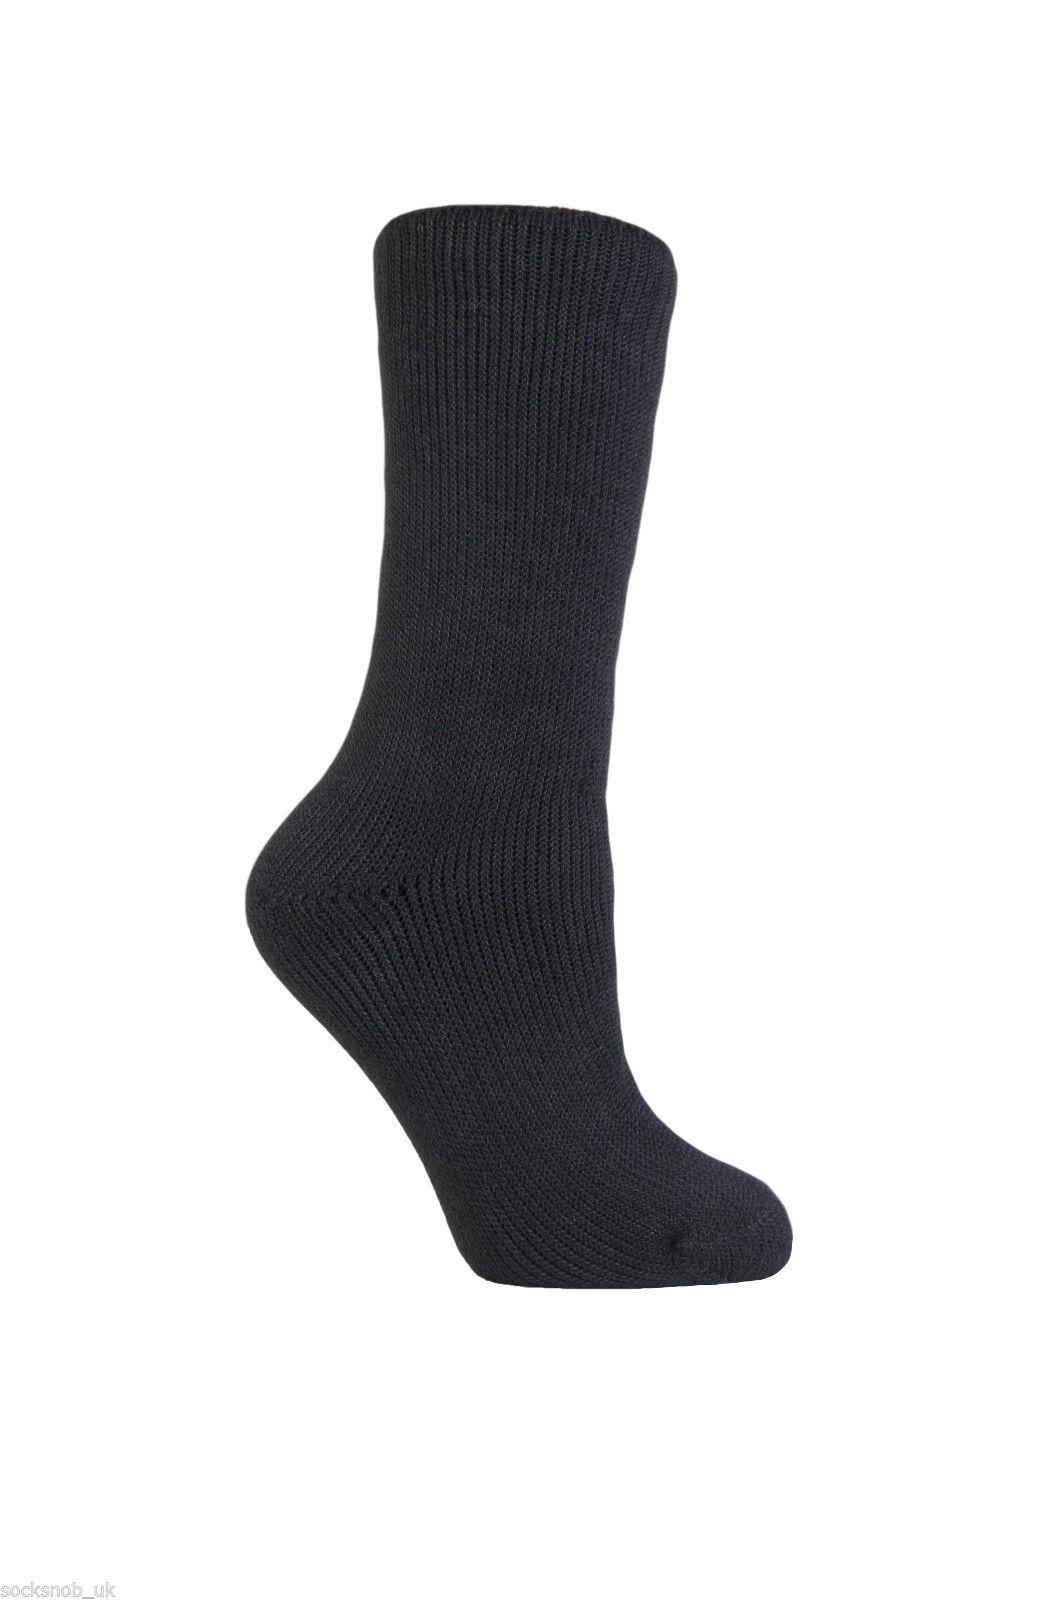 Heat Force - Multi Pack Thick Winter Warm Thermal Socks,4-8 uk, 37-42 eur